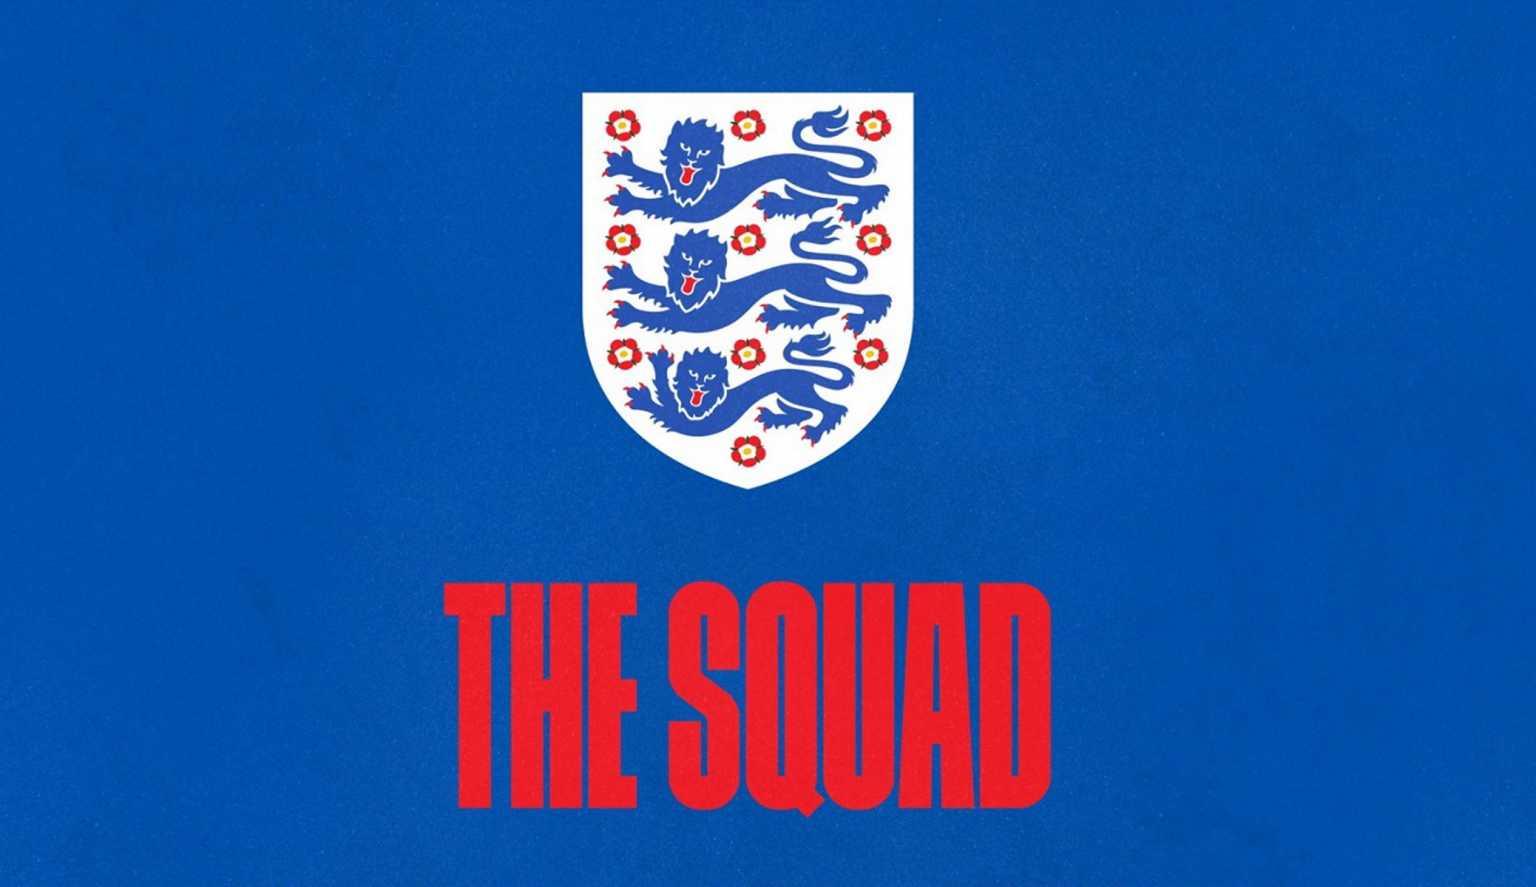 Euro 2020: Οι Άγγλοι απέλυσαν τους σεκιούριτι της αποστολής επειδή δεν ένιωθαν ασφαλείς